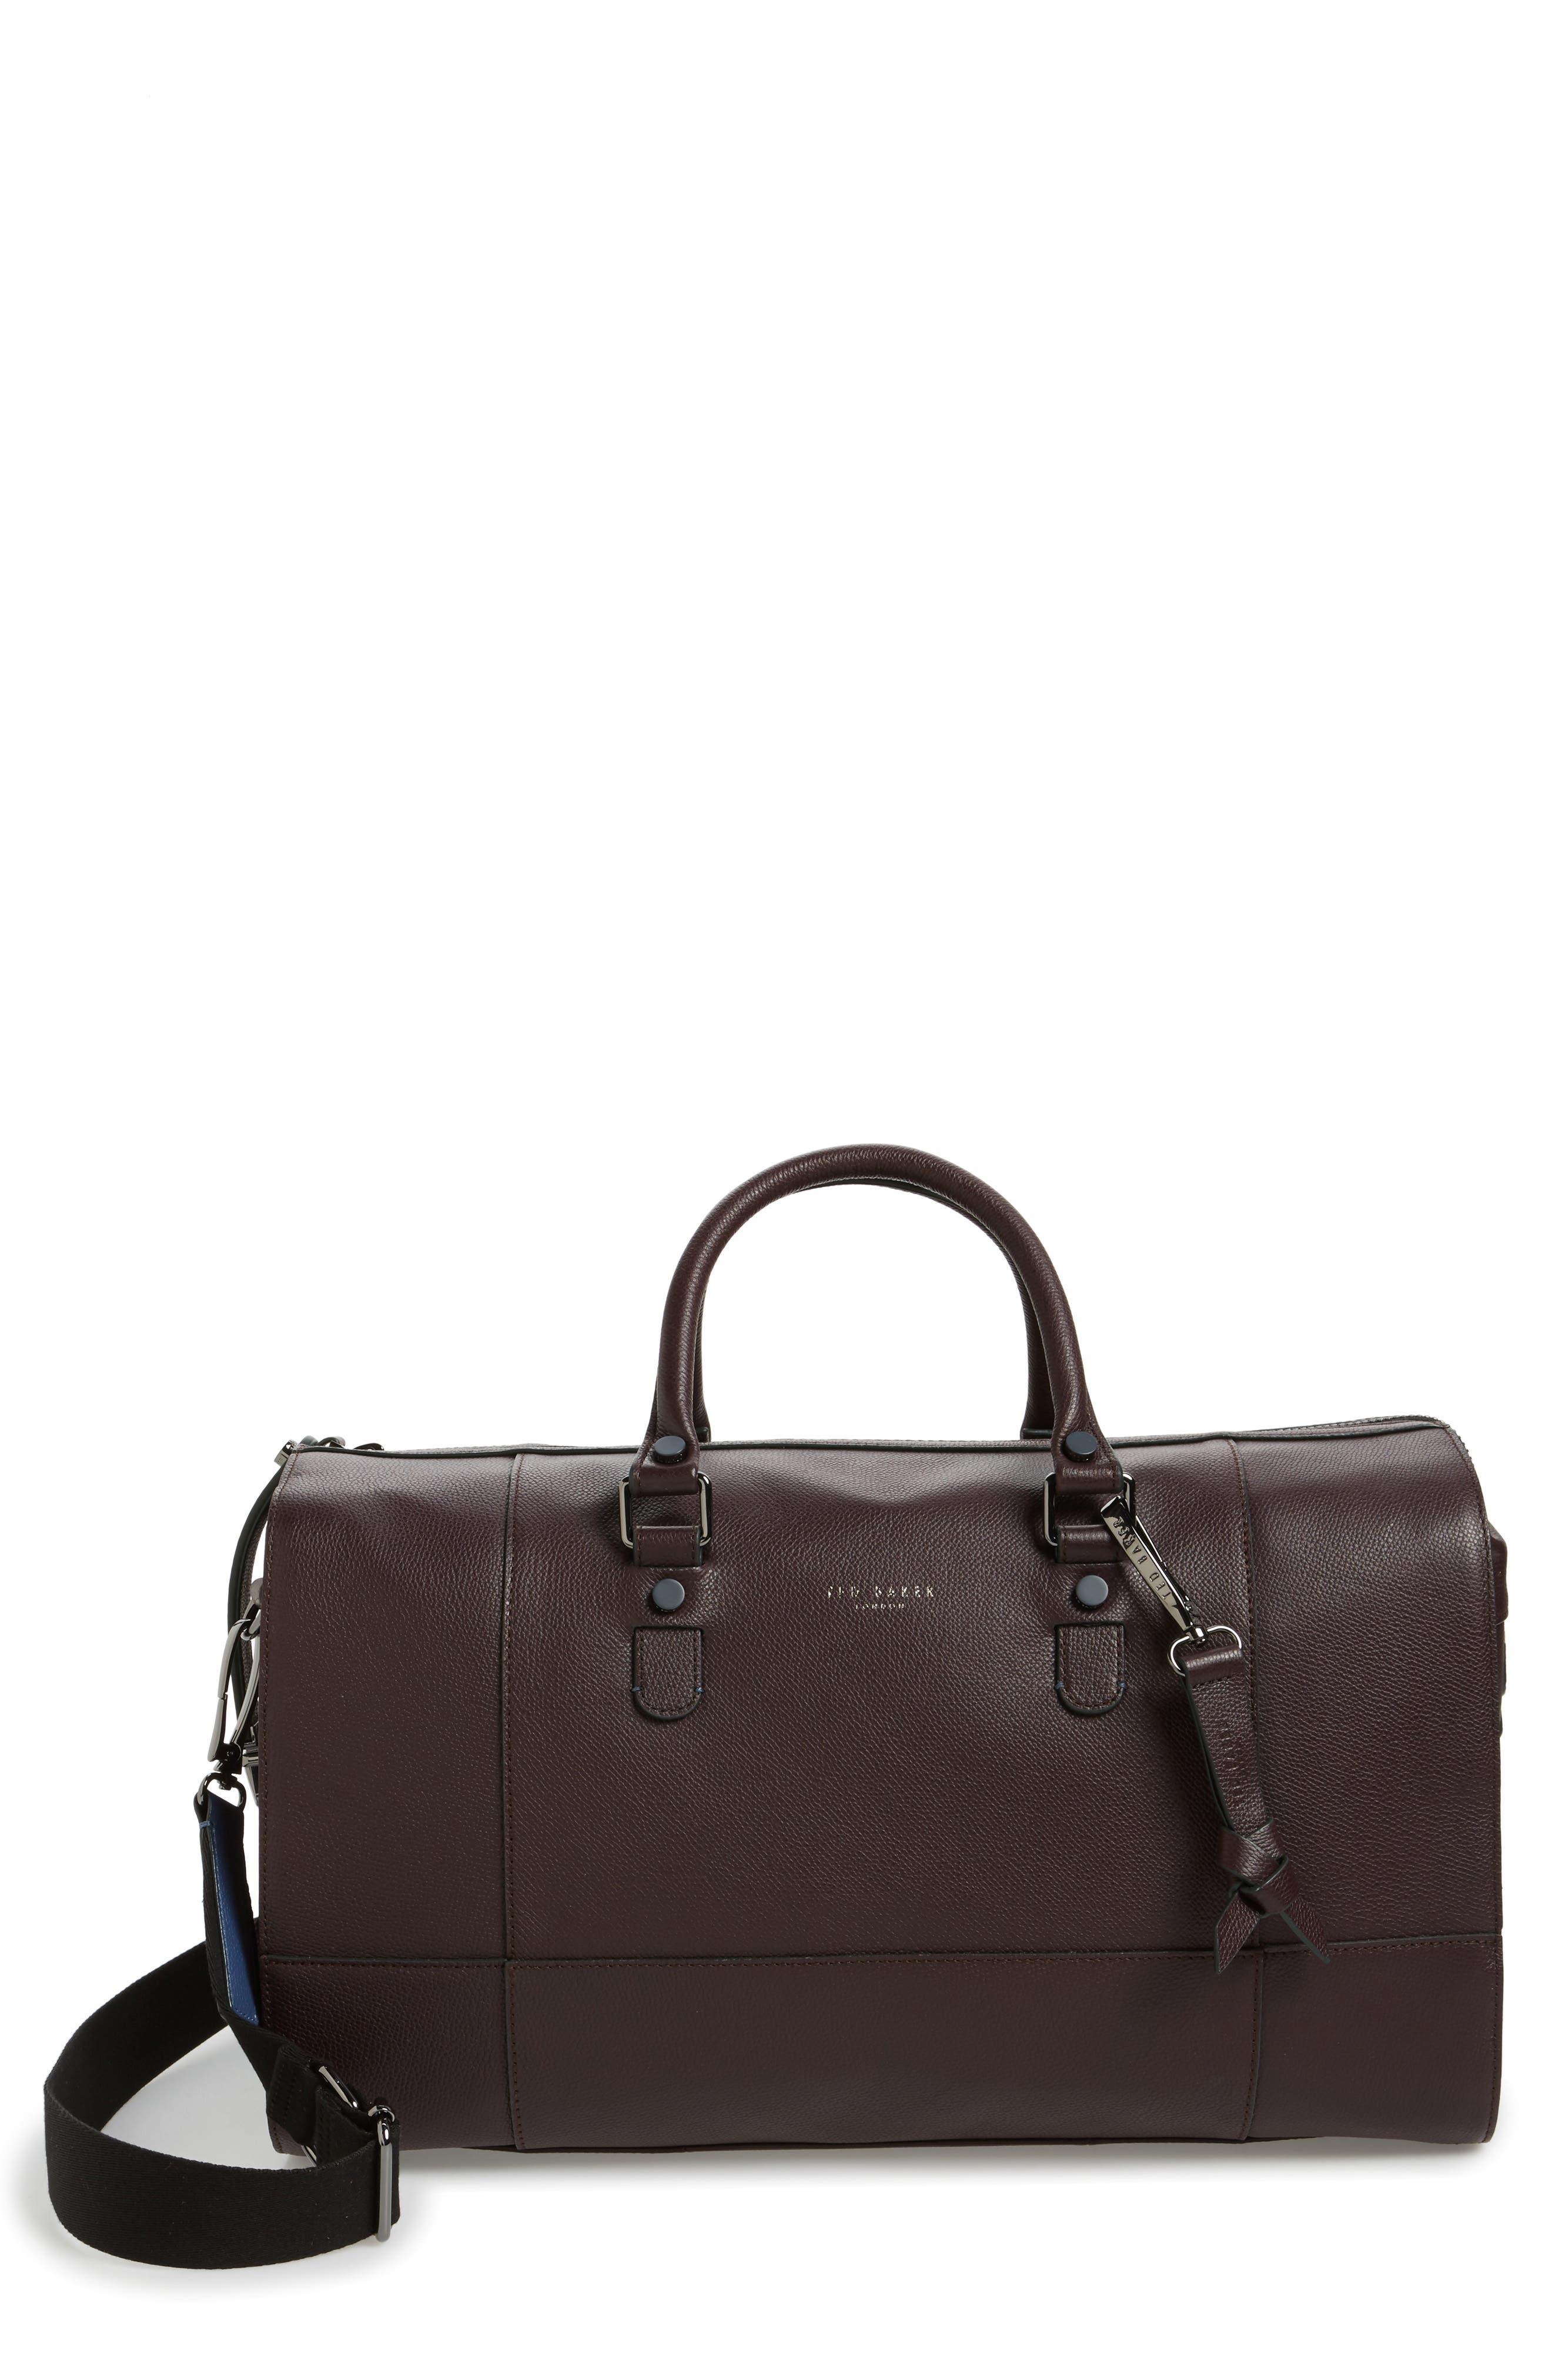 Main Image - Ted Baker London Panthea Leather Duffel Bag